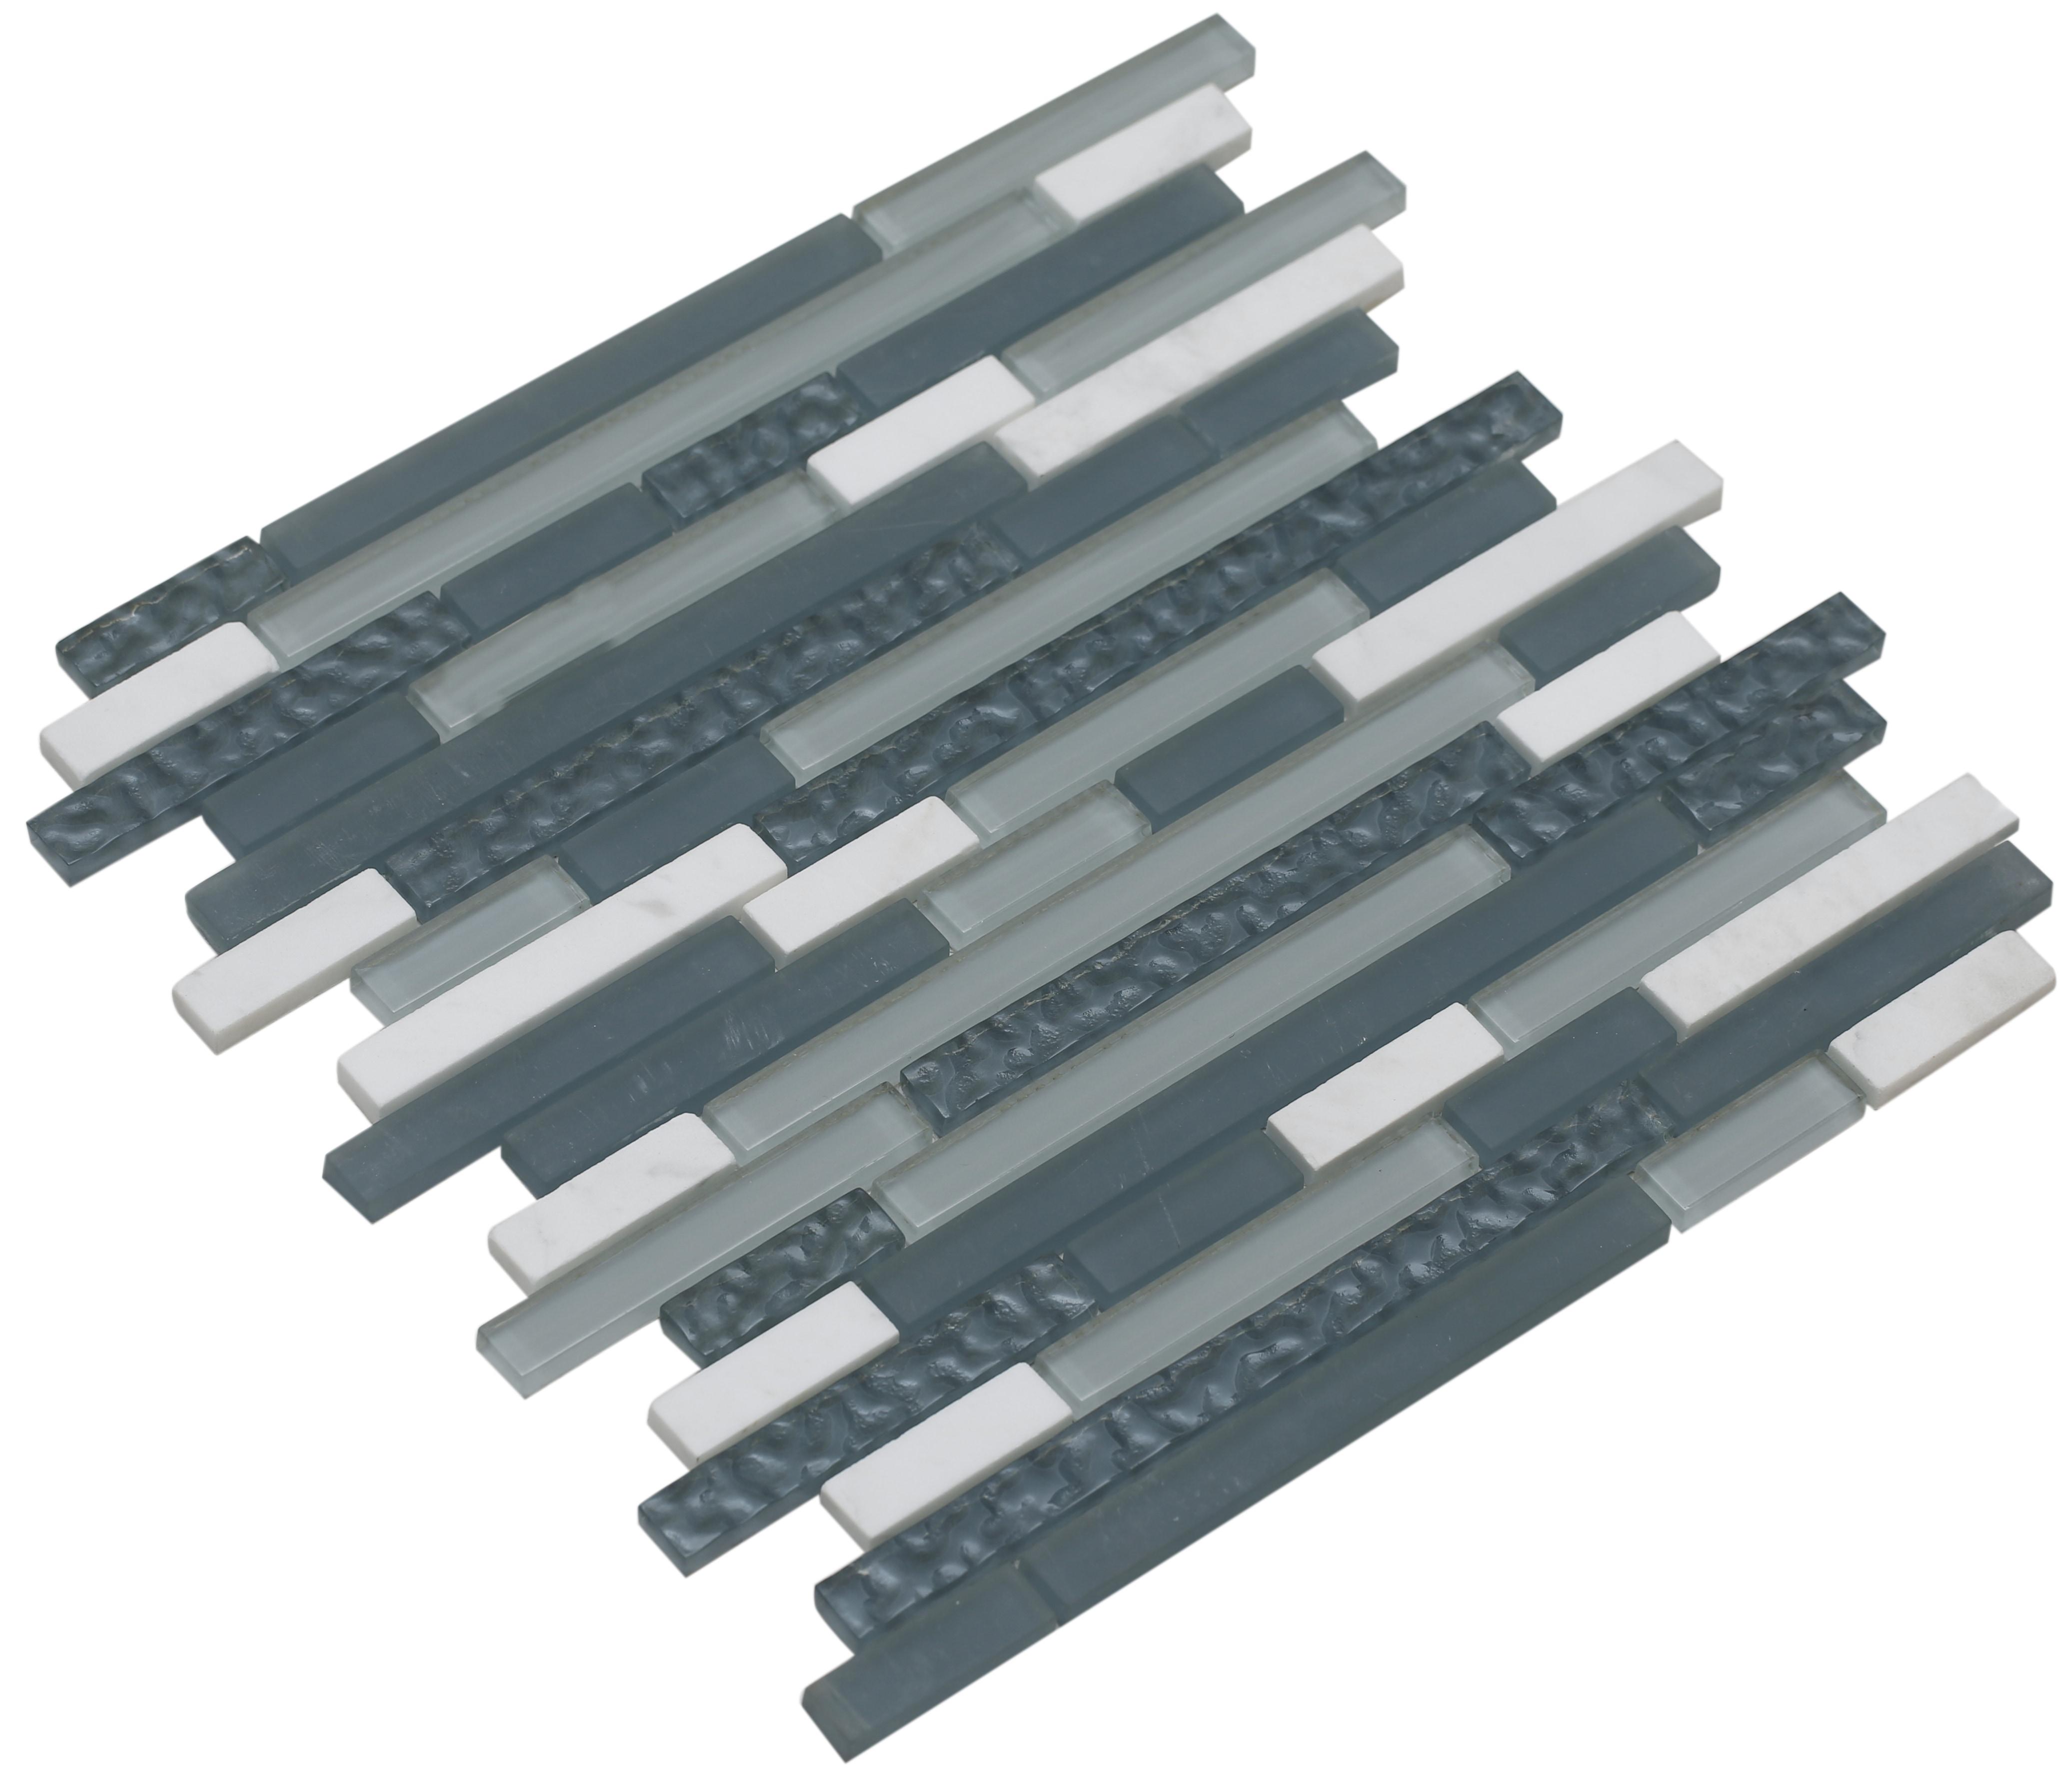 Light gray matte, shiny light silver, and shiny textured light slate gray glass with white stone / Interlocking Fara Series 0